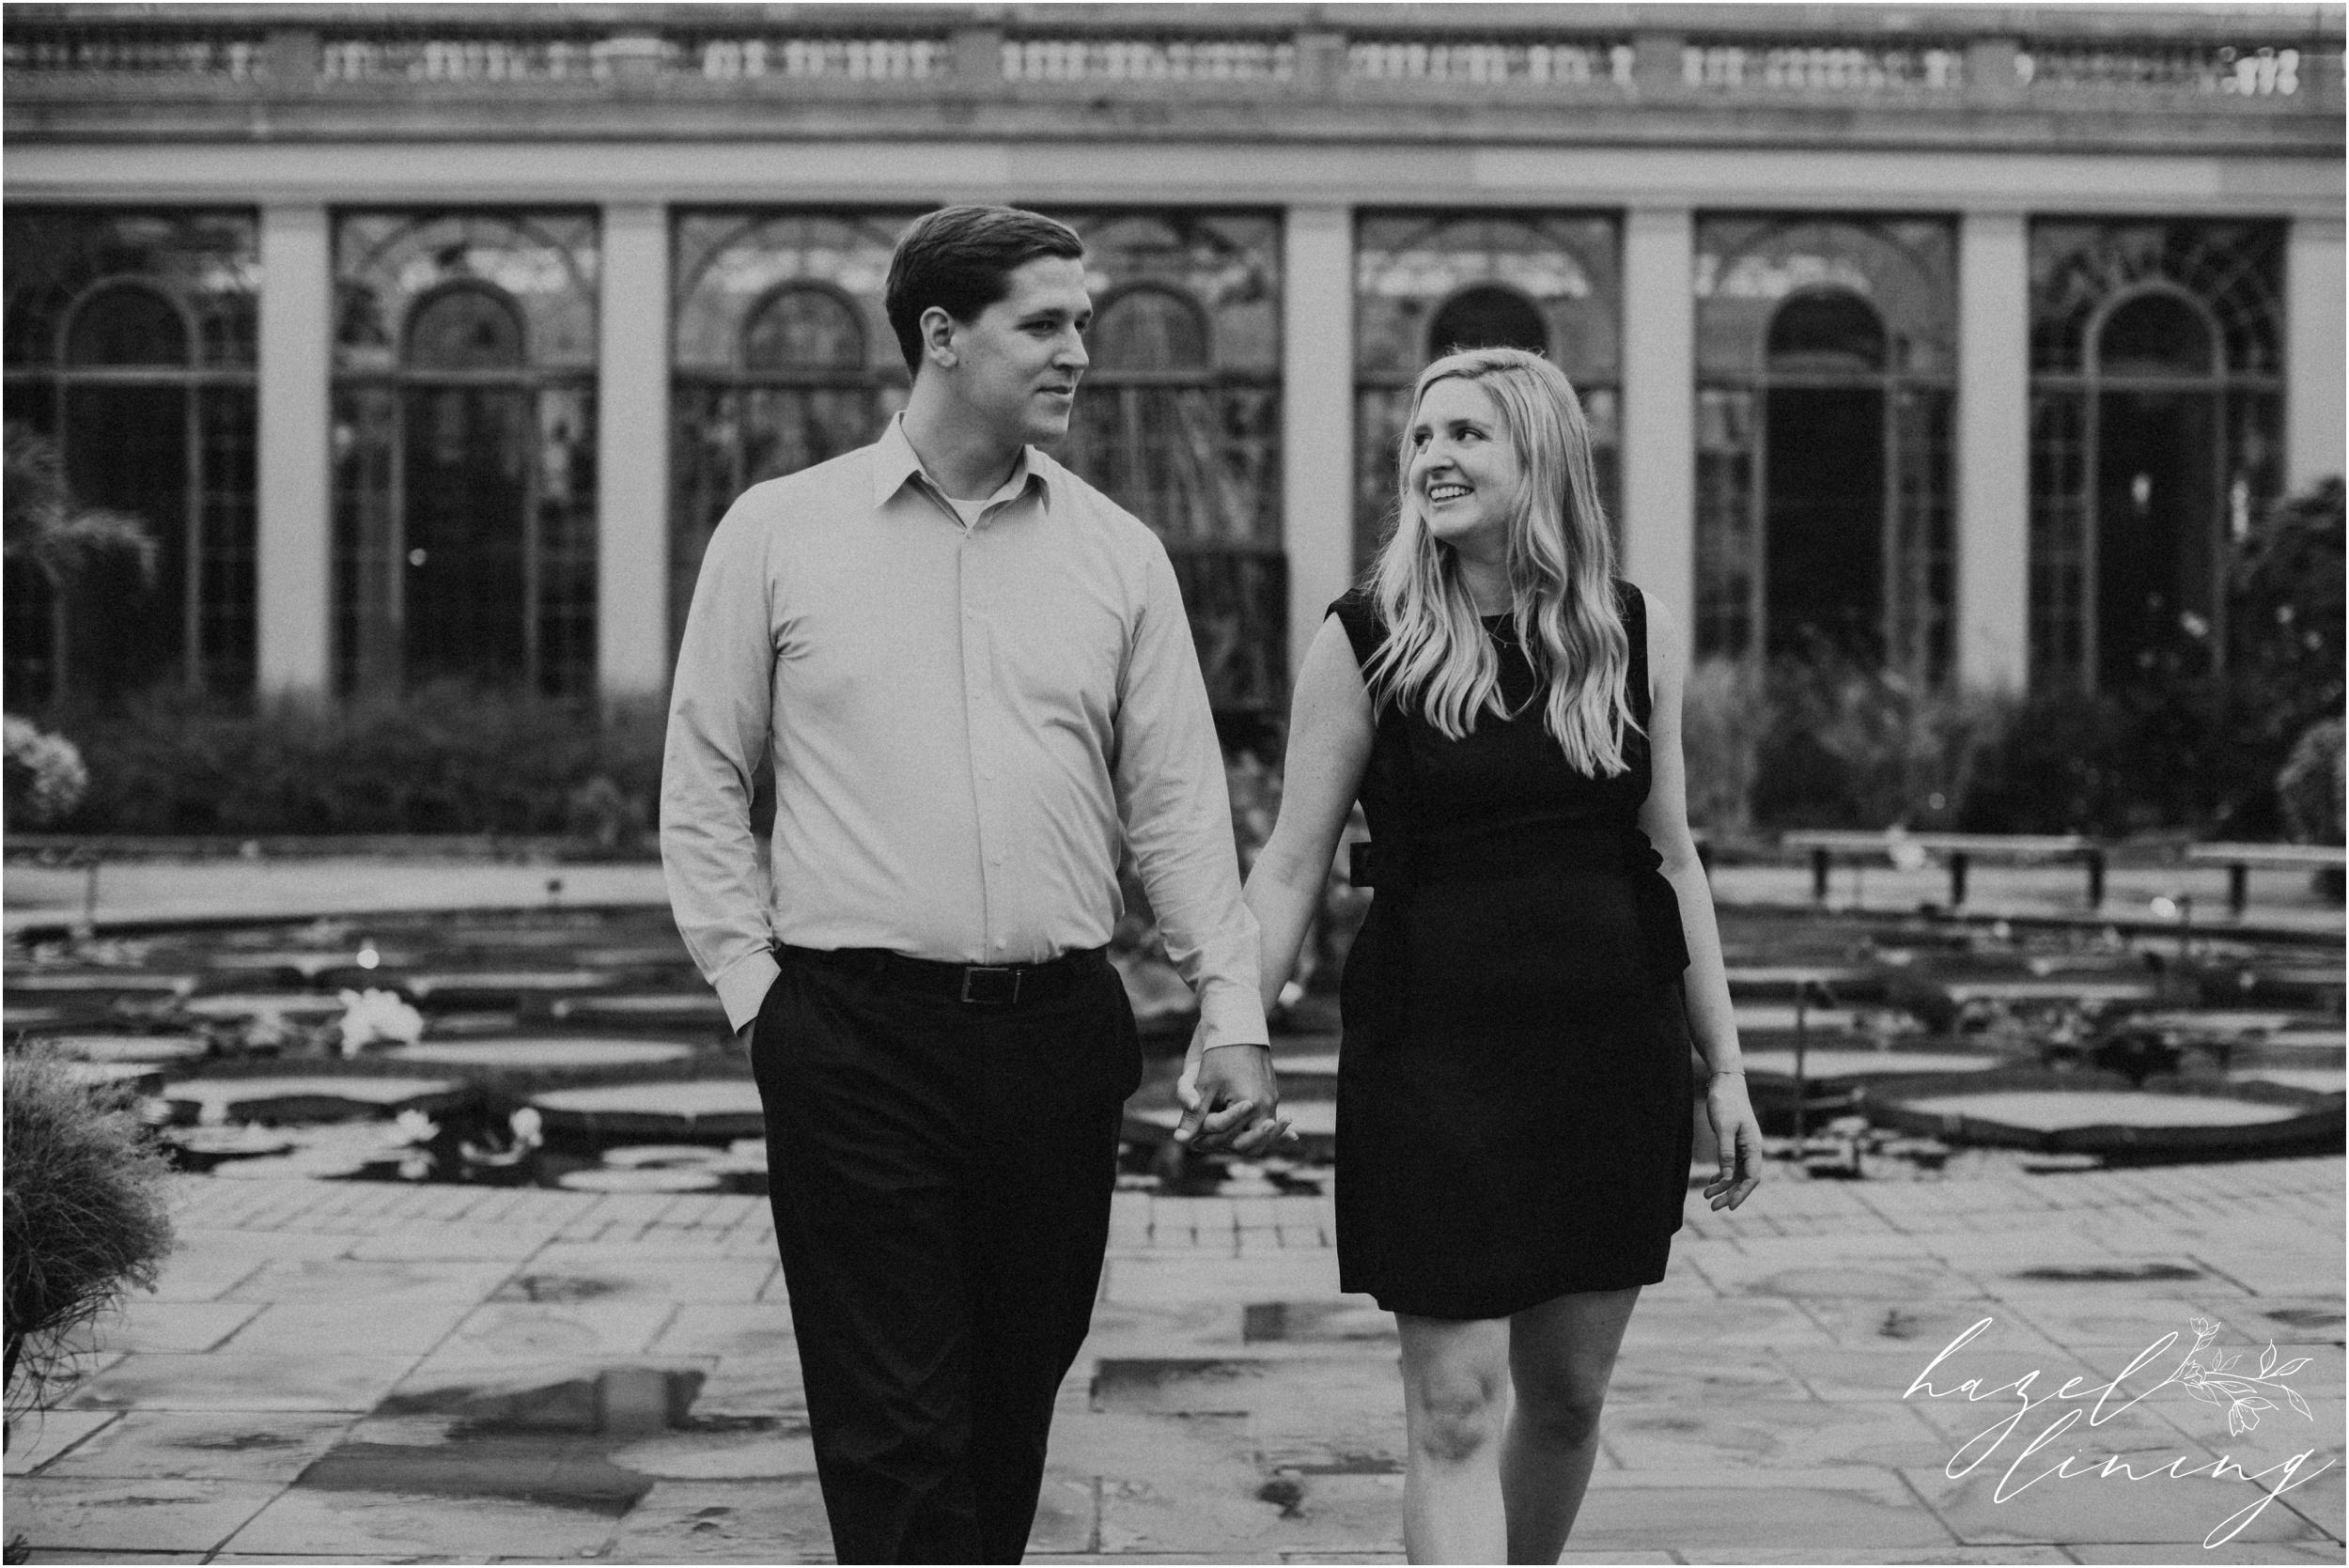 victoria-travis-logan-mayes-longwood-gardens-kennett-square-philadelphia-engagement-session-hazel-lining-photography-destination-elopement-wedding-engagement-photography_0047.jpg